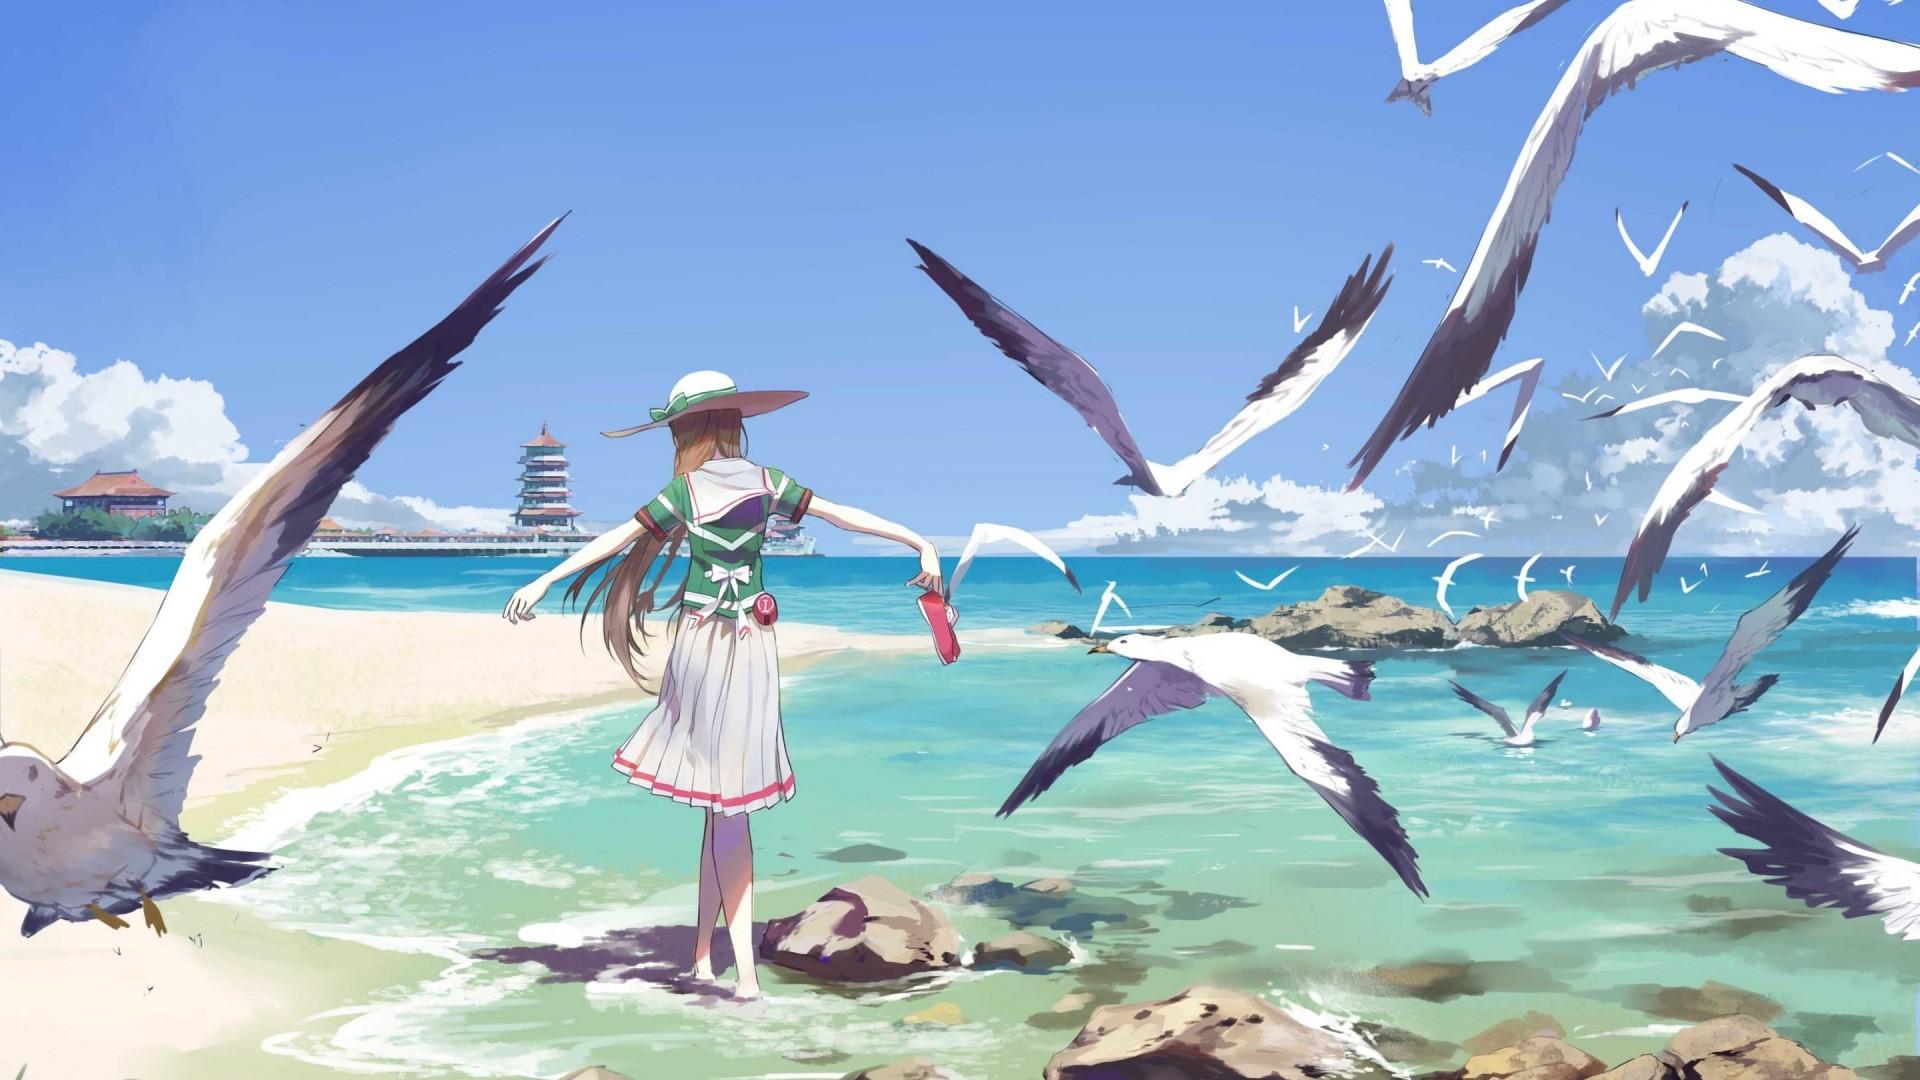 Anime Beach wallpaper for computer